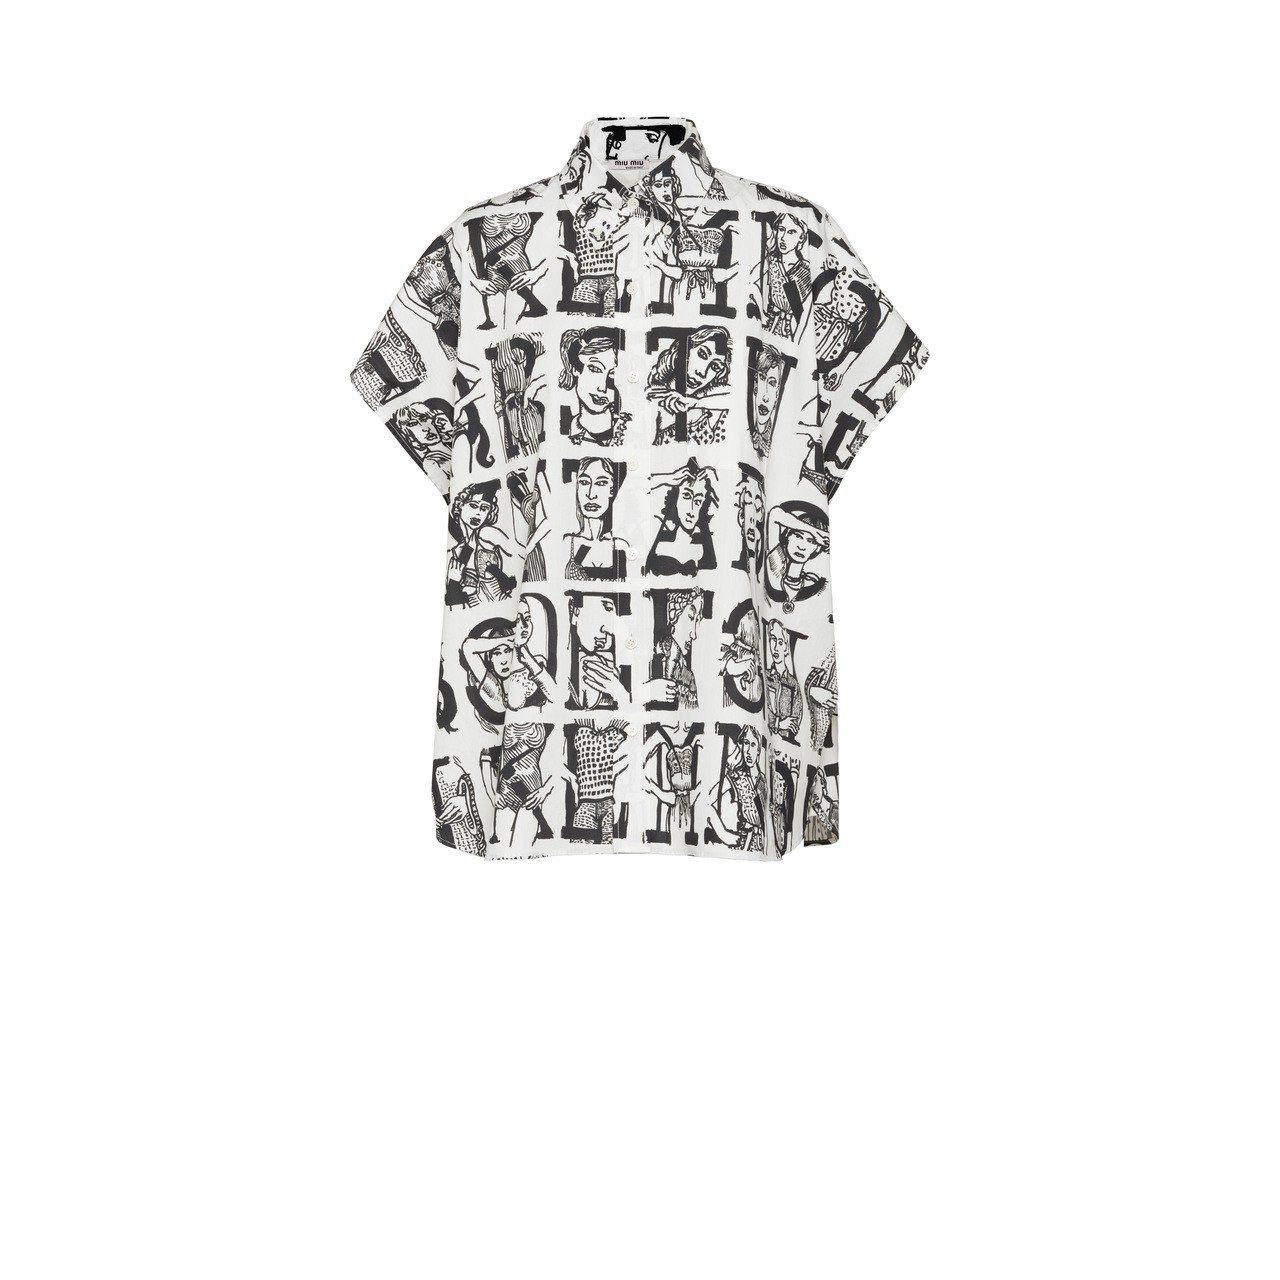 MiuMiu Type字母印花襯衫(非訂製款)27,500元。圖/Miu Miu...